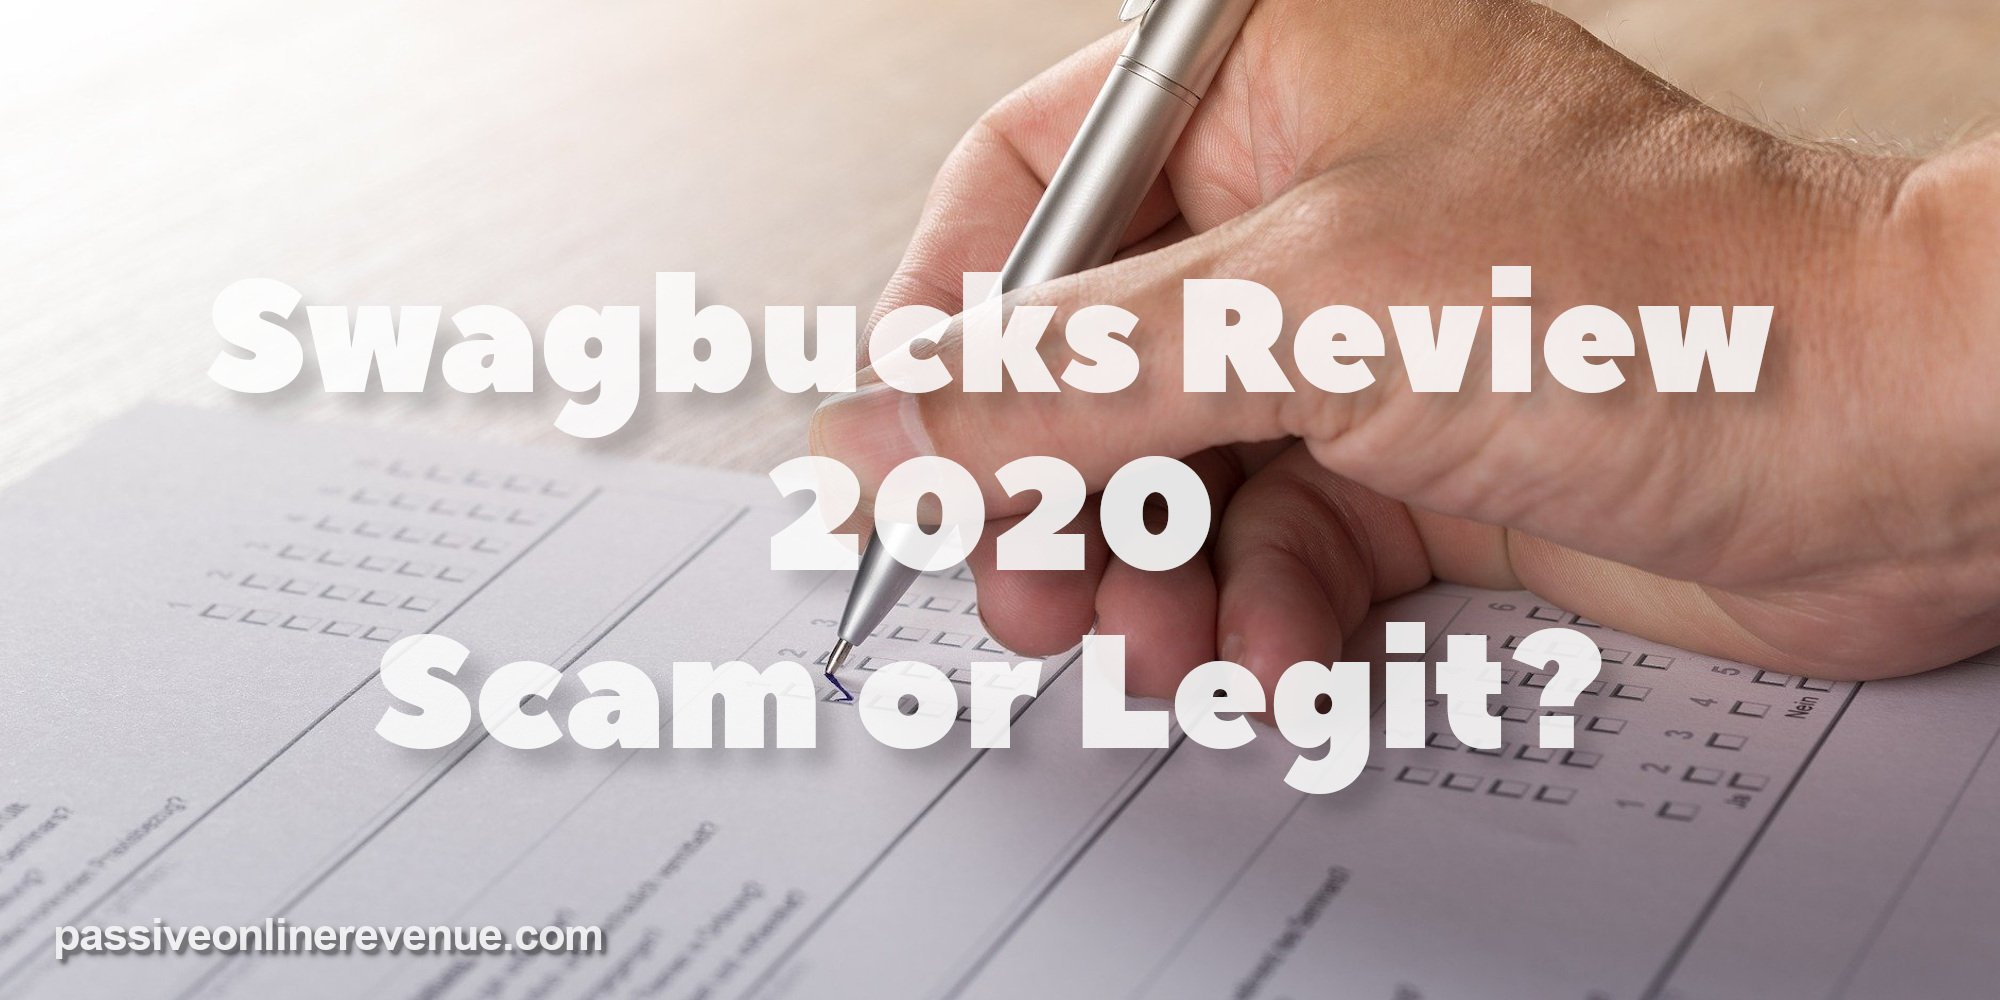 Swagbucks Review 2020 - Scam or Legit?